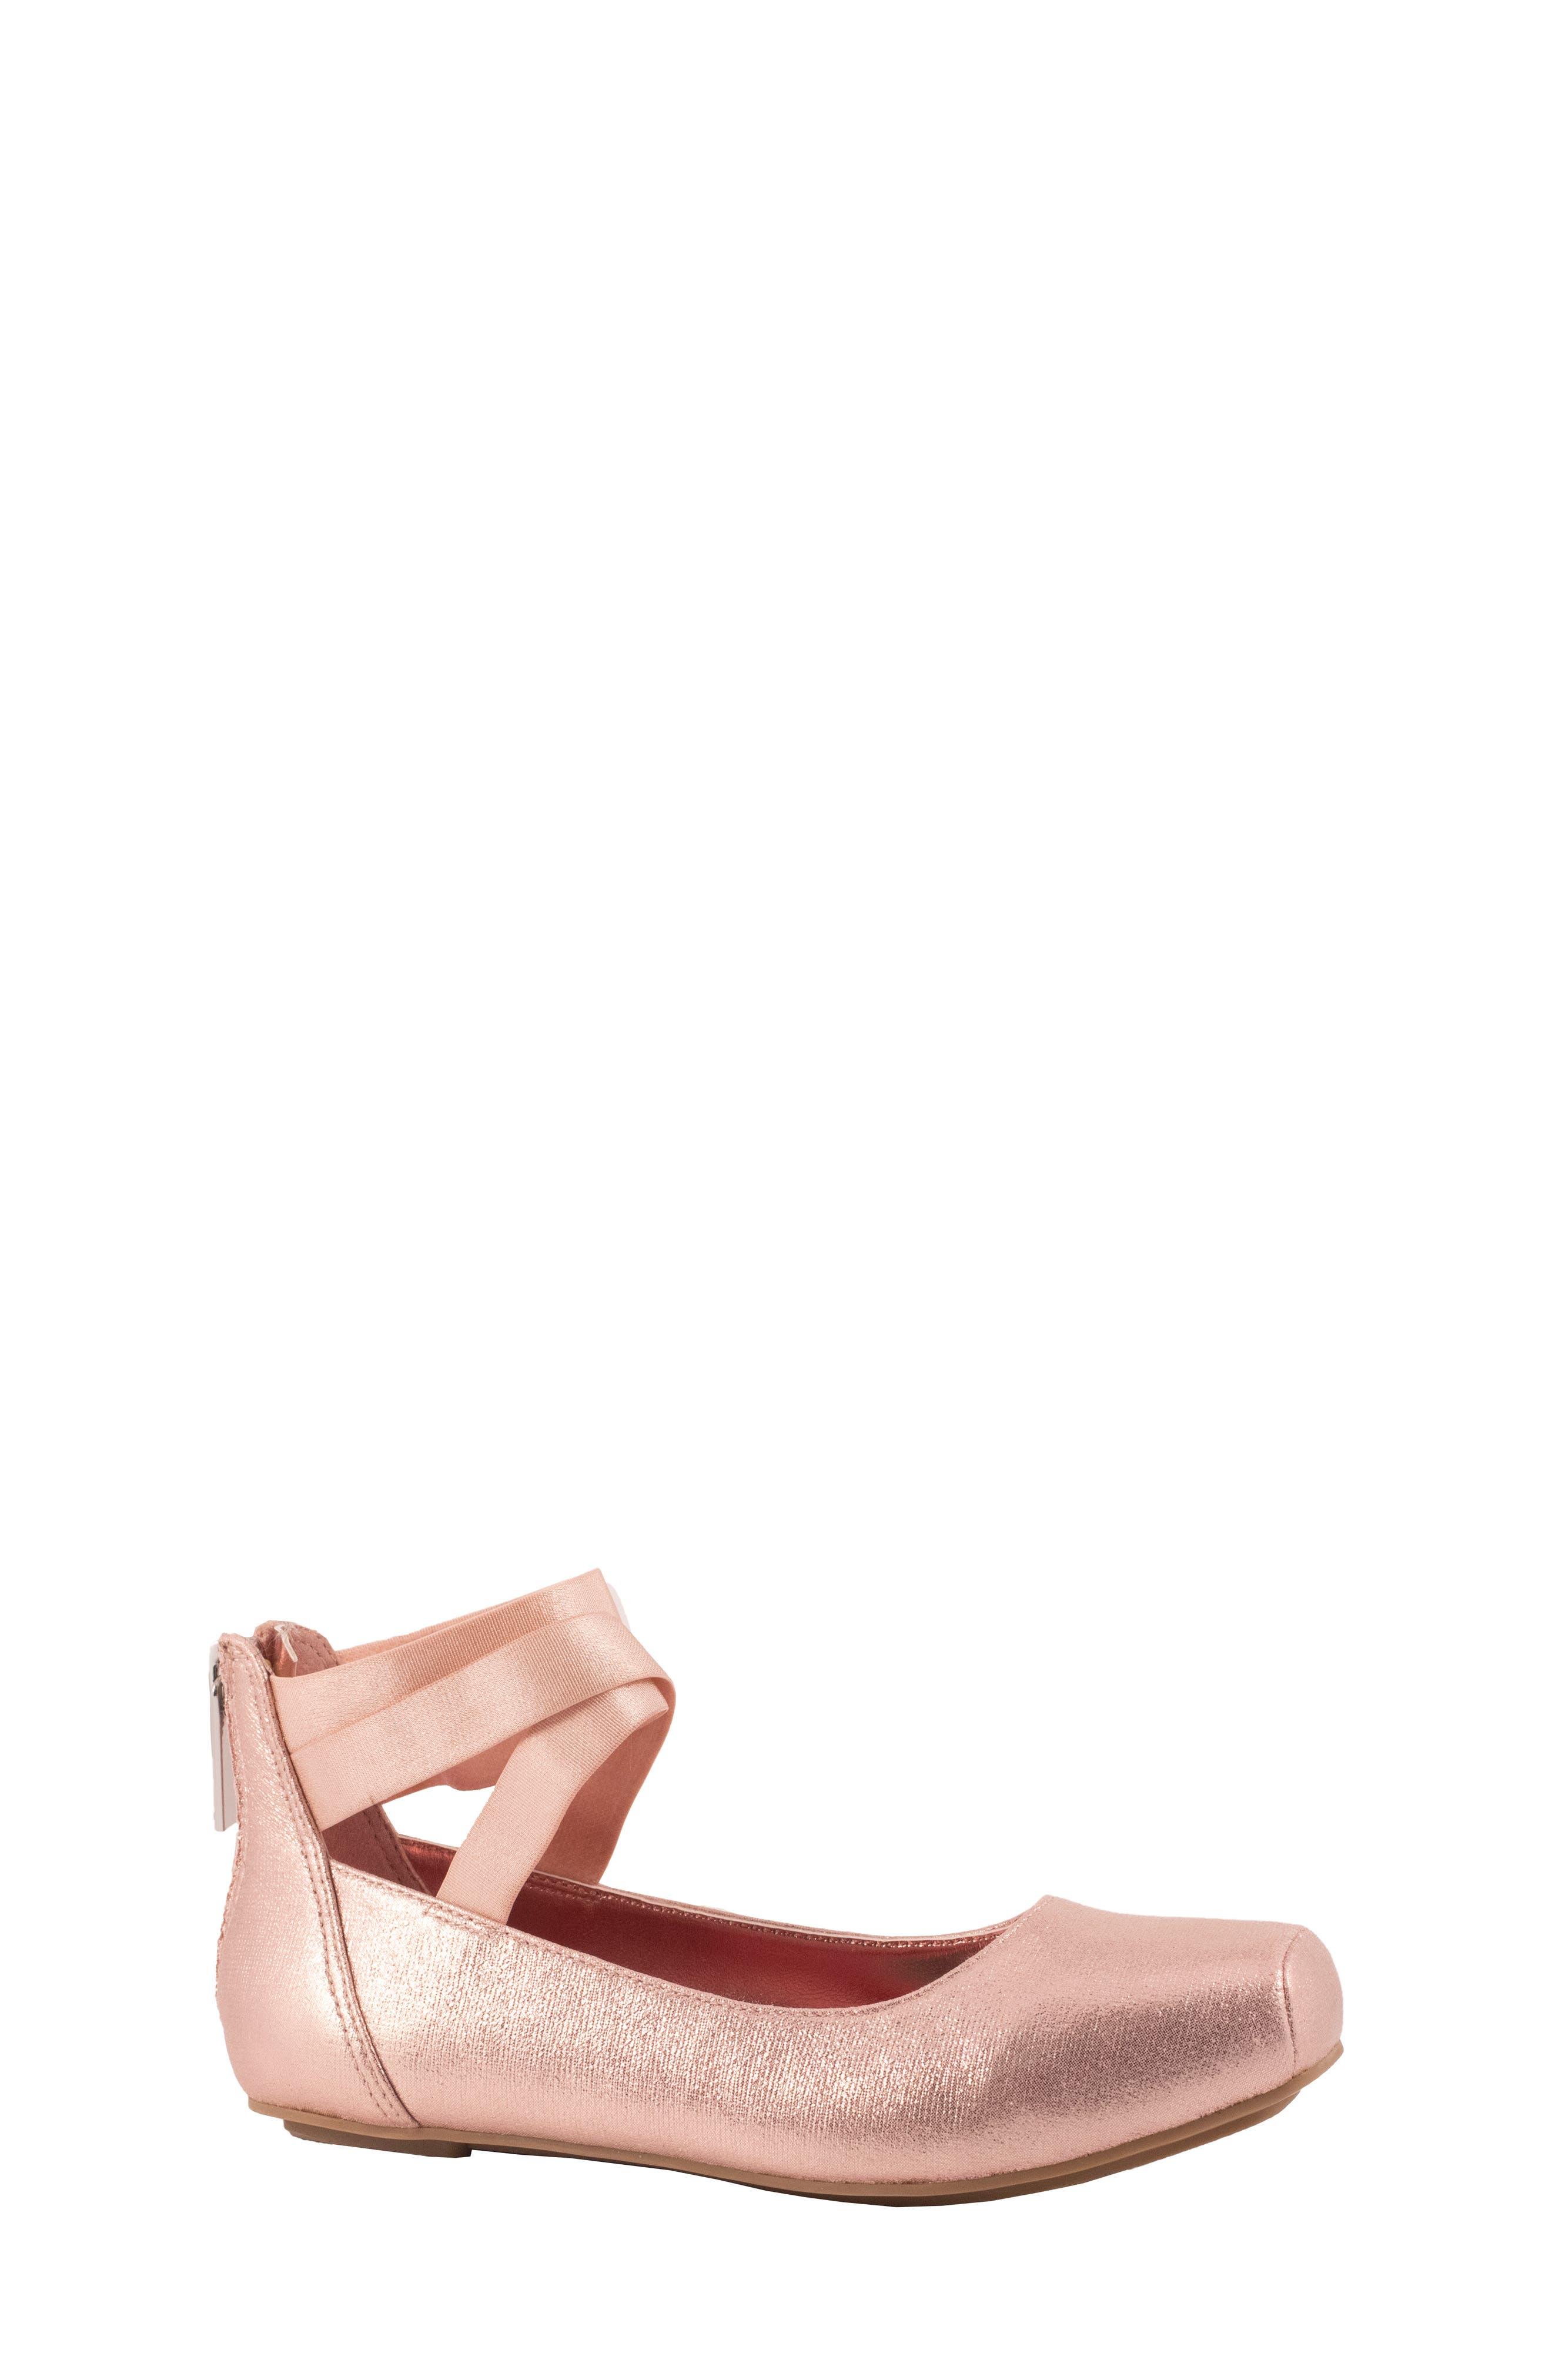 Hedley Ballet Flat, Main, color, BLUSH